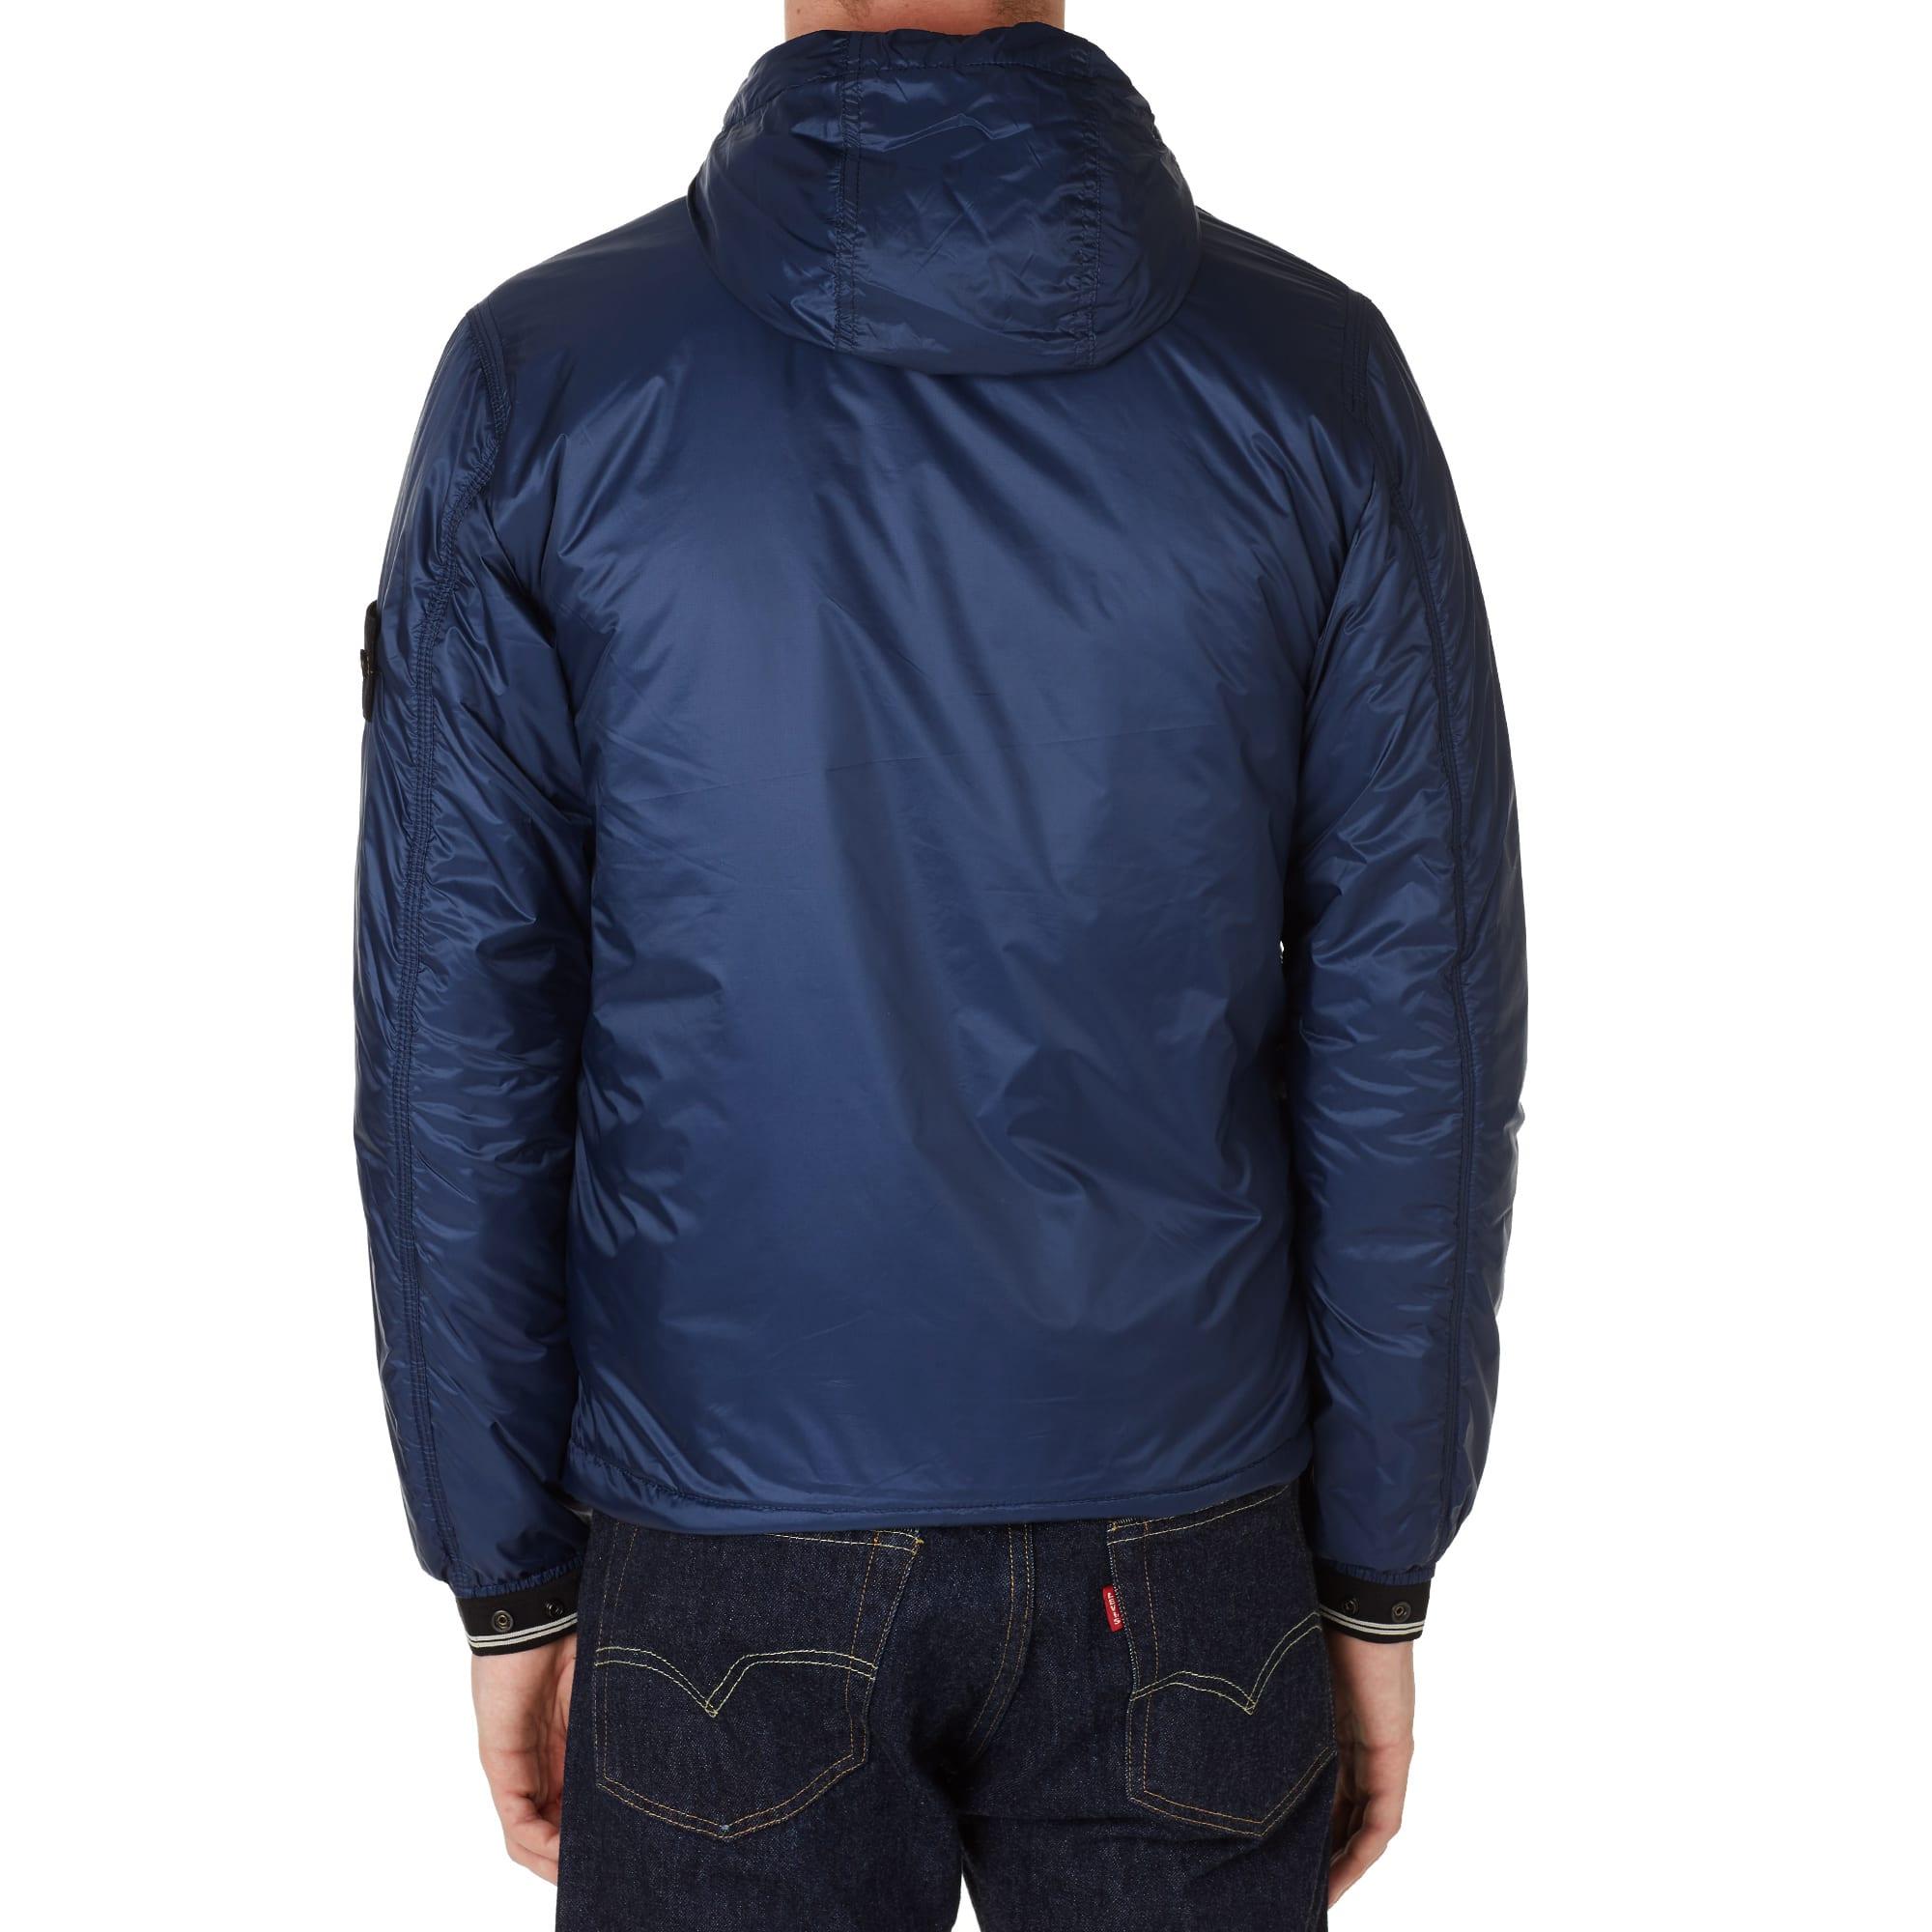 stone island micro ripstop navy blue hooded jacket -